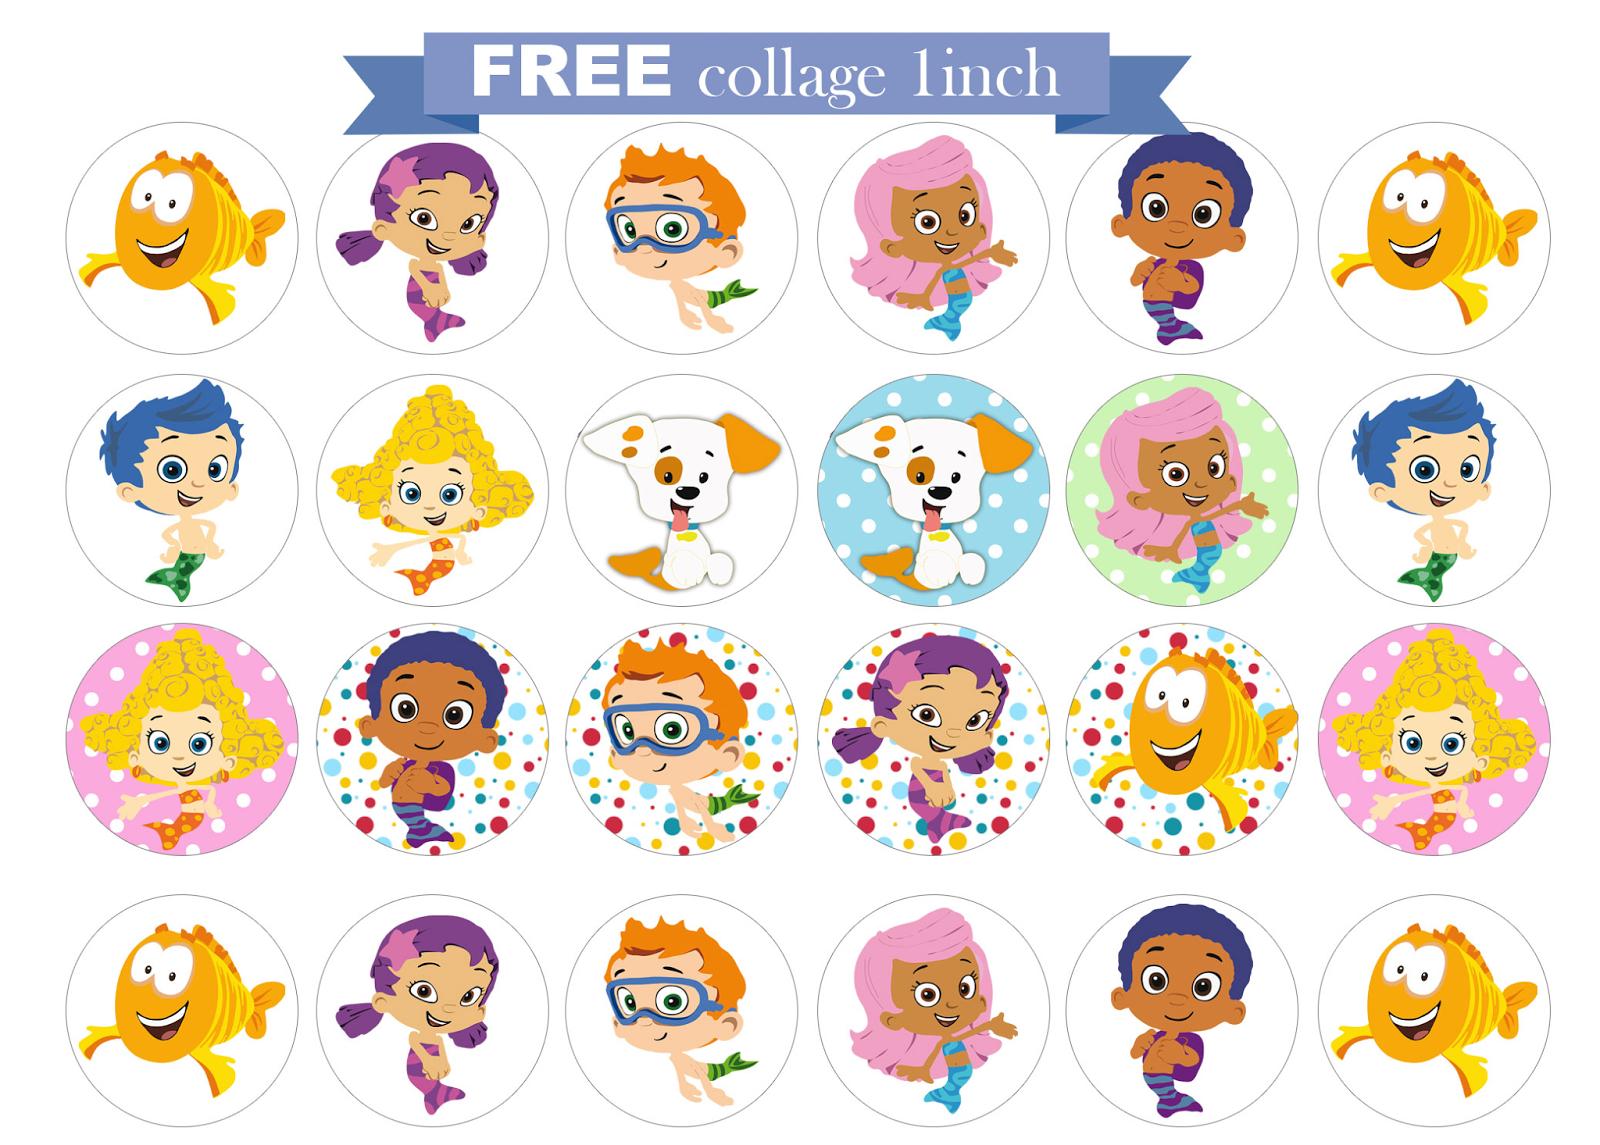 Free Printable Invitation: Bubble Guppies Free Collage 1 Inch. - Bubble Guppies Free Printables